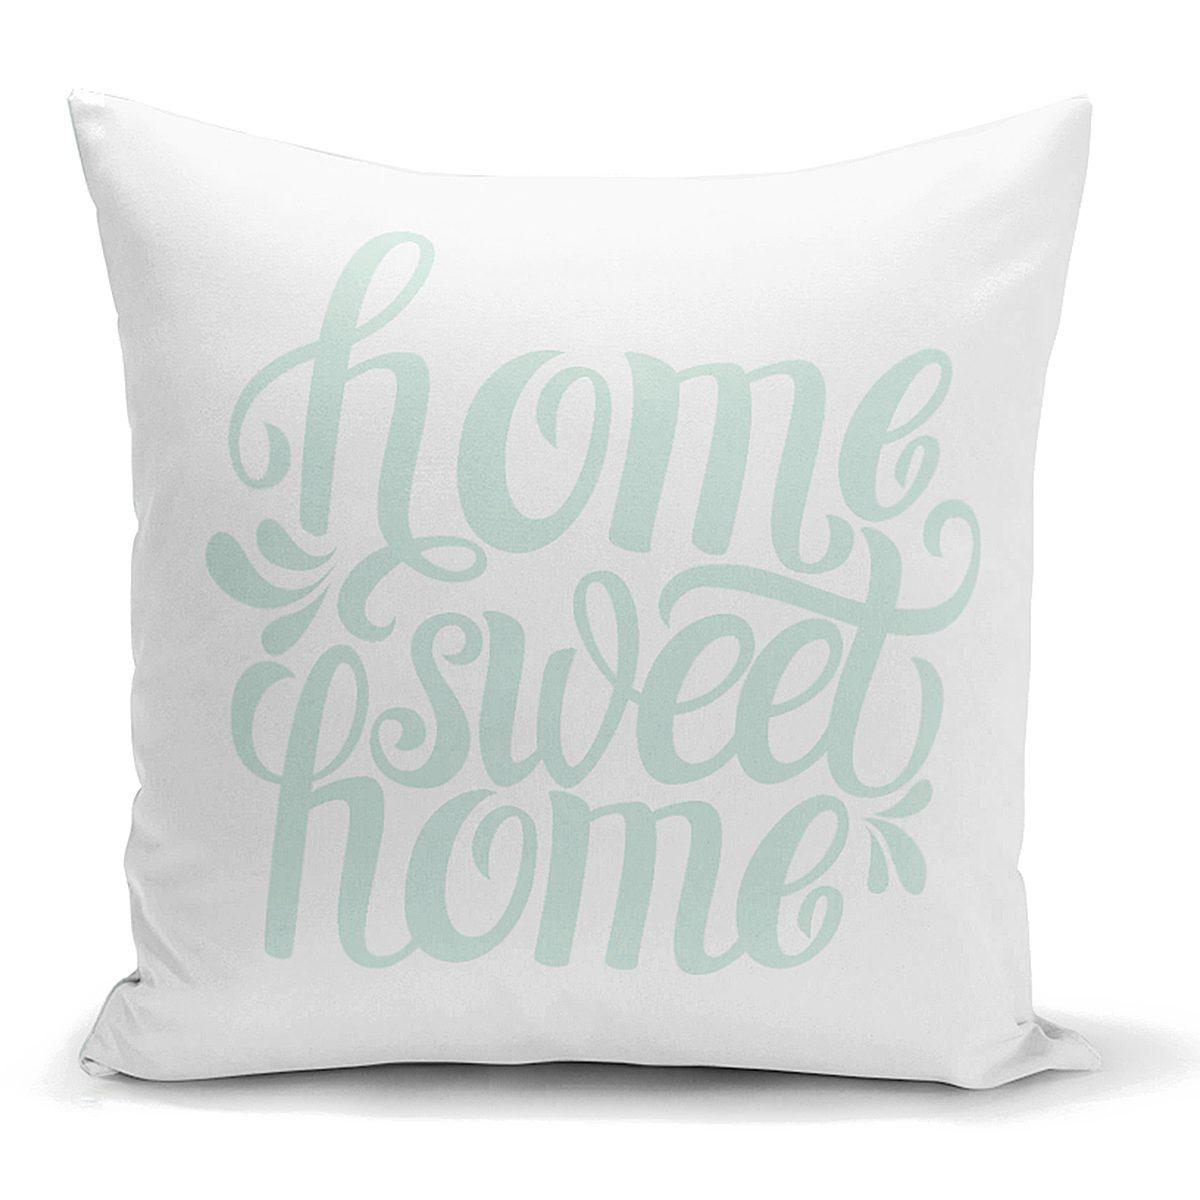 Bulut Mavi Home Sweet Home Dekoratif Yastık Kırlent Kılıfı Realhomes